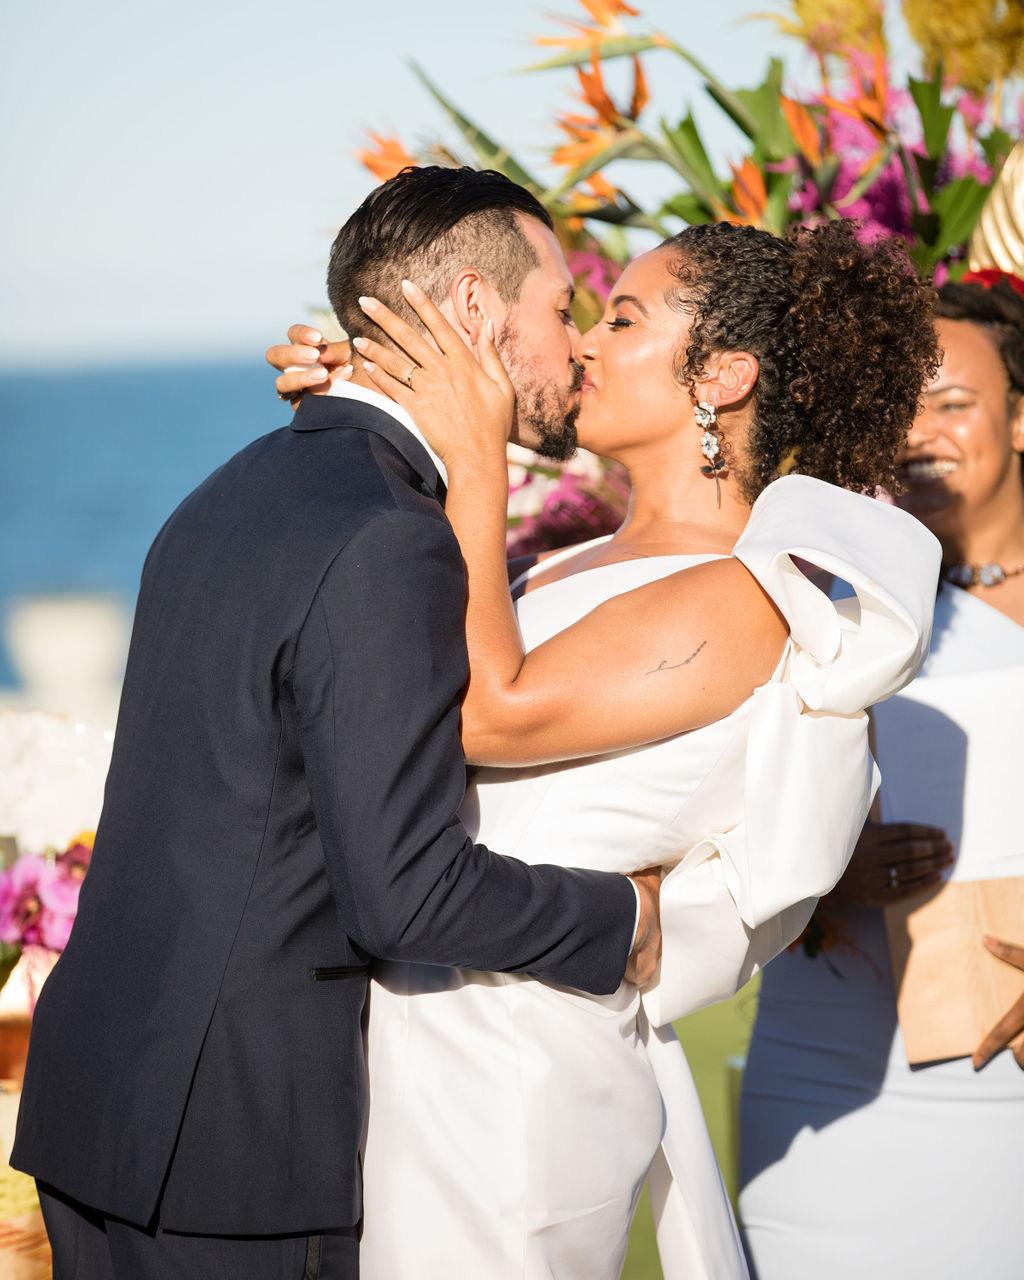 dalila elliot wedding couple ceremony kiss